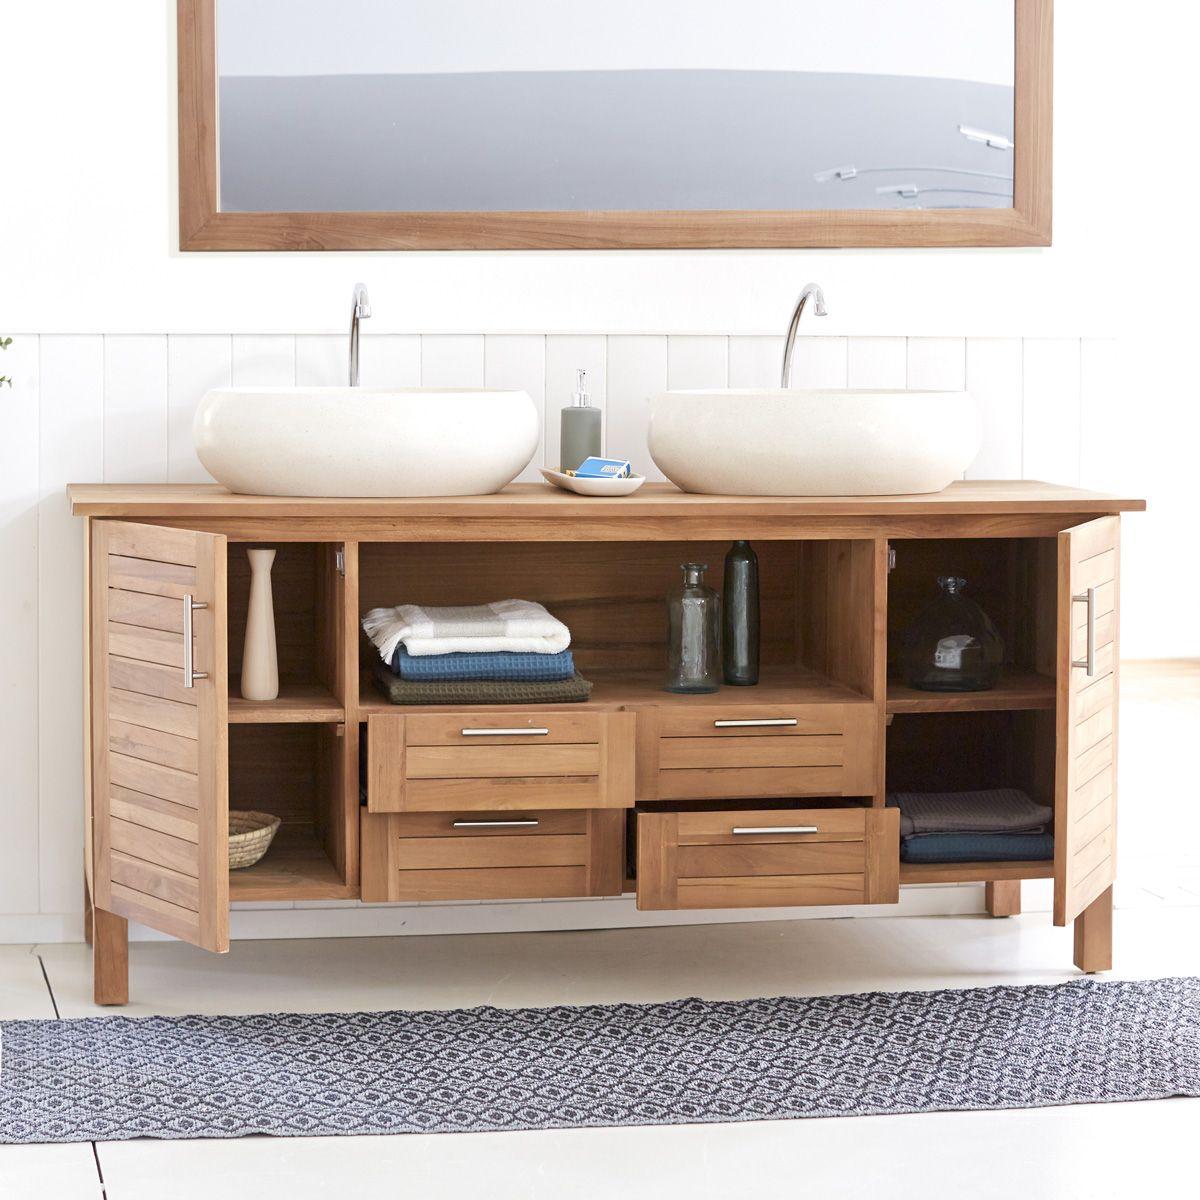 Meuble Double Vasque En Teck 165 Cm Meuble Salle De Bain Unterschrank Badezimmerideen Badezimmer